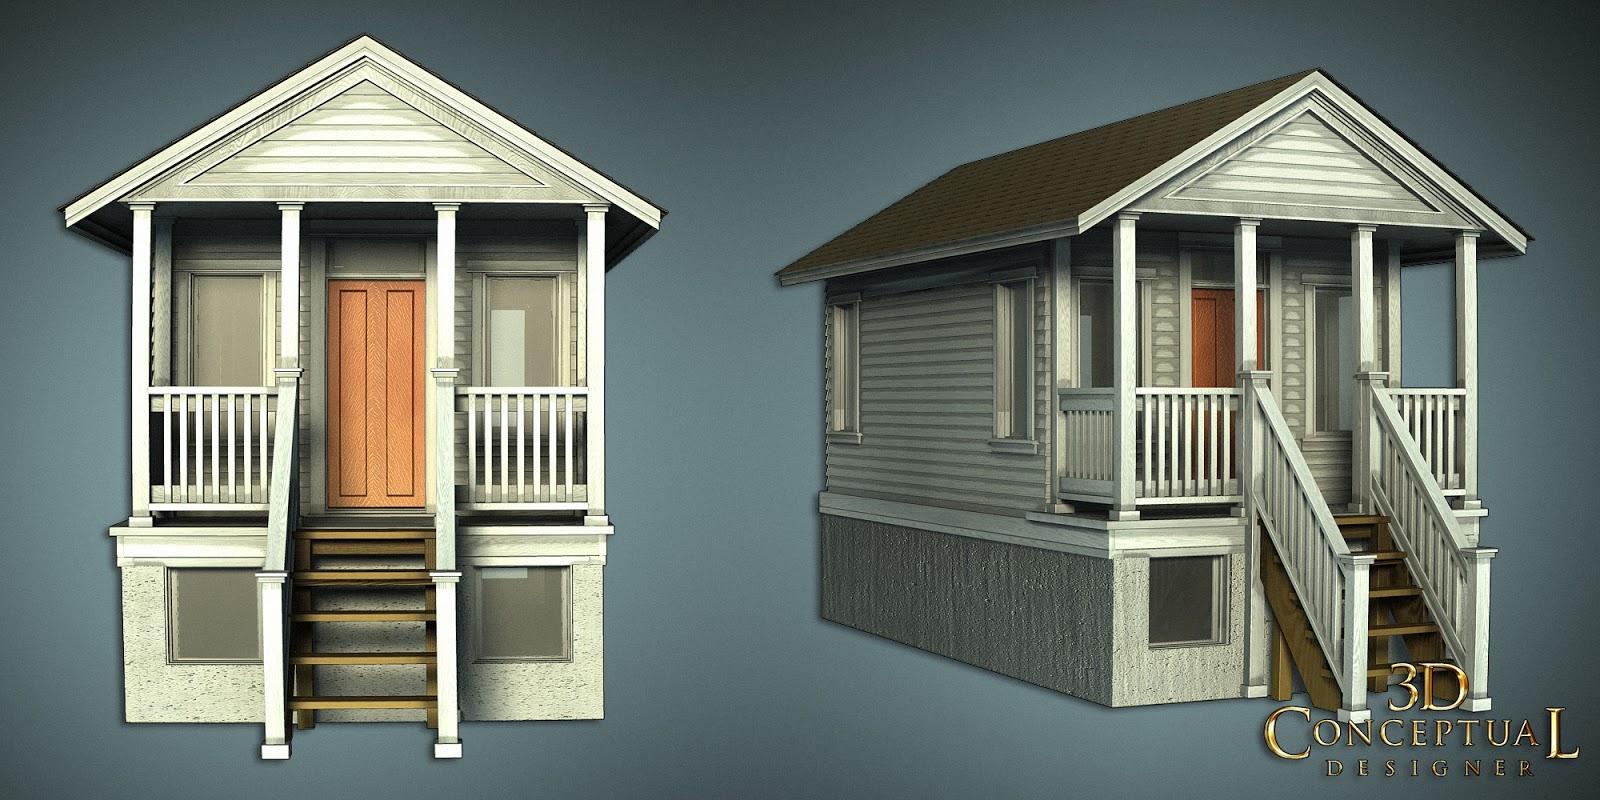 3dconceptualdesignerblog Project Review Tiny House